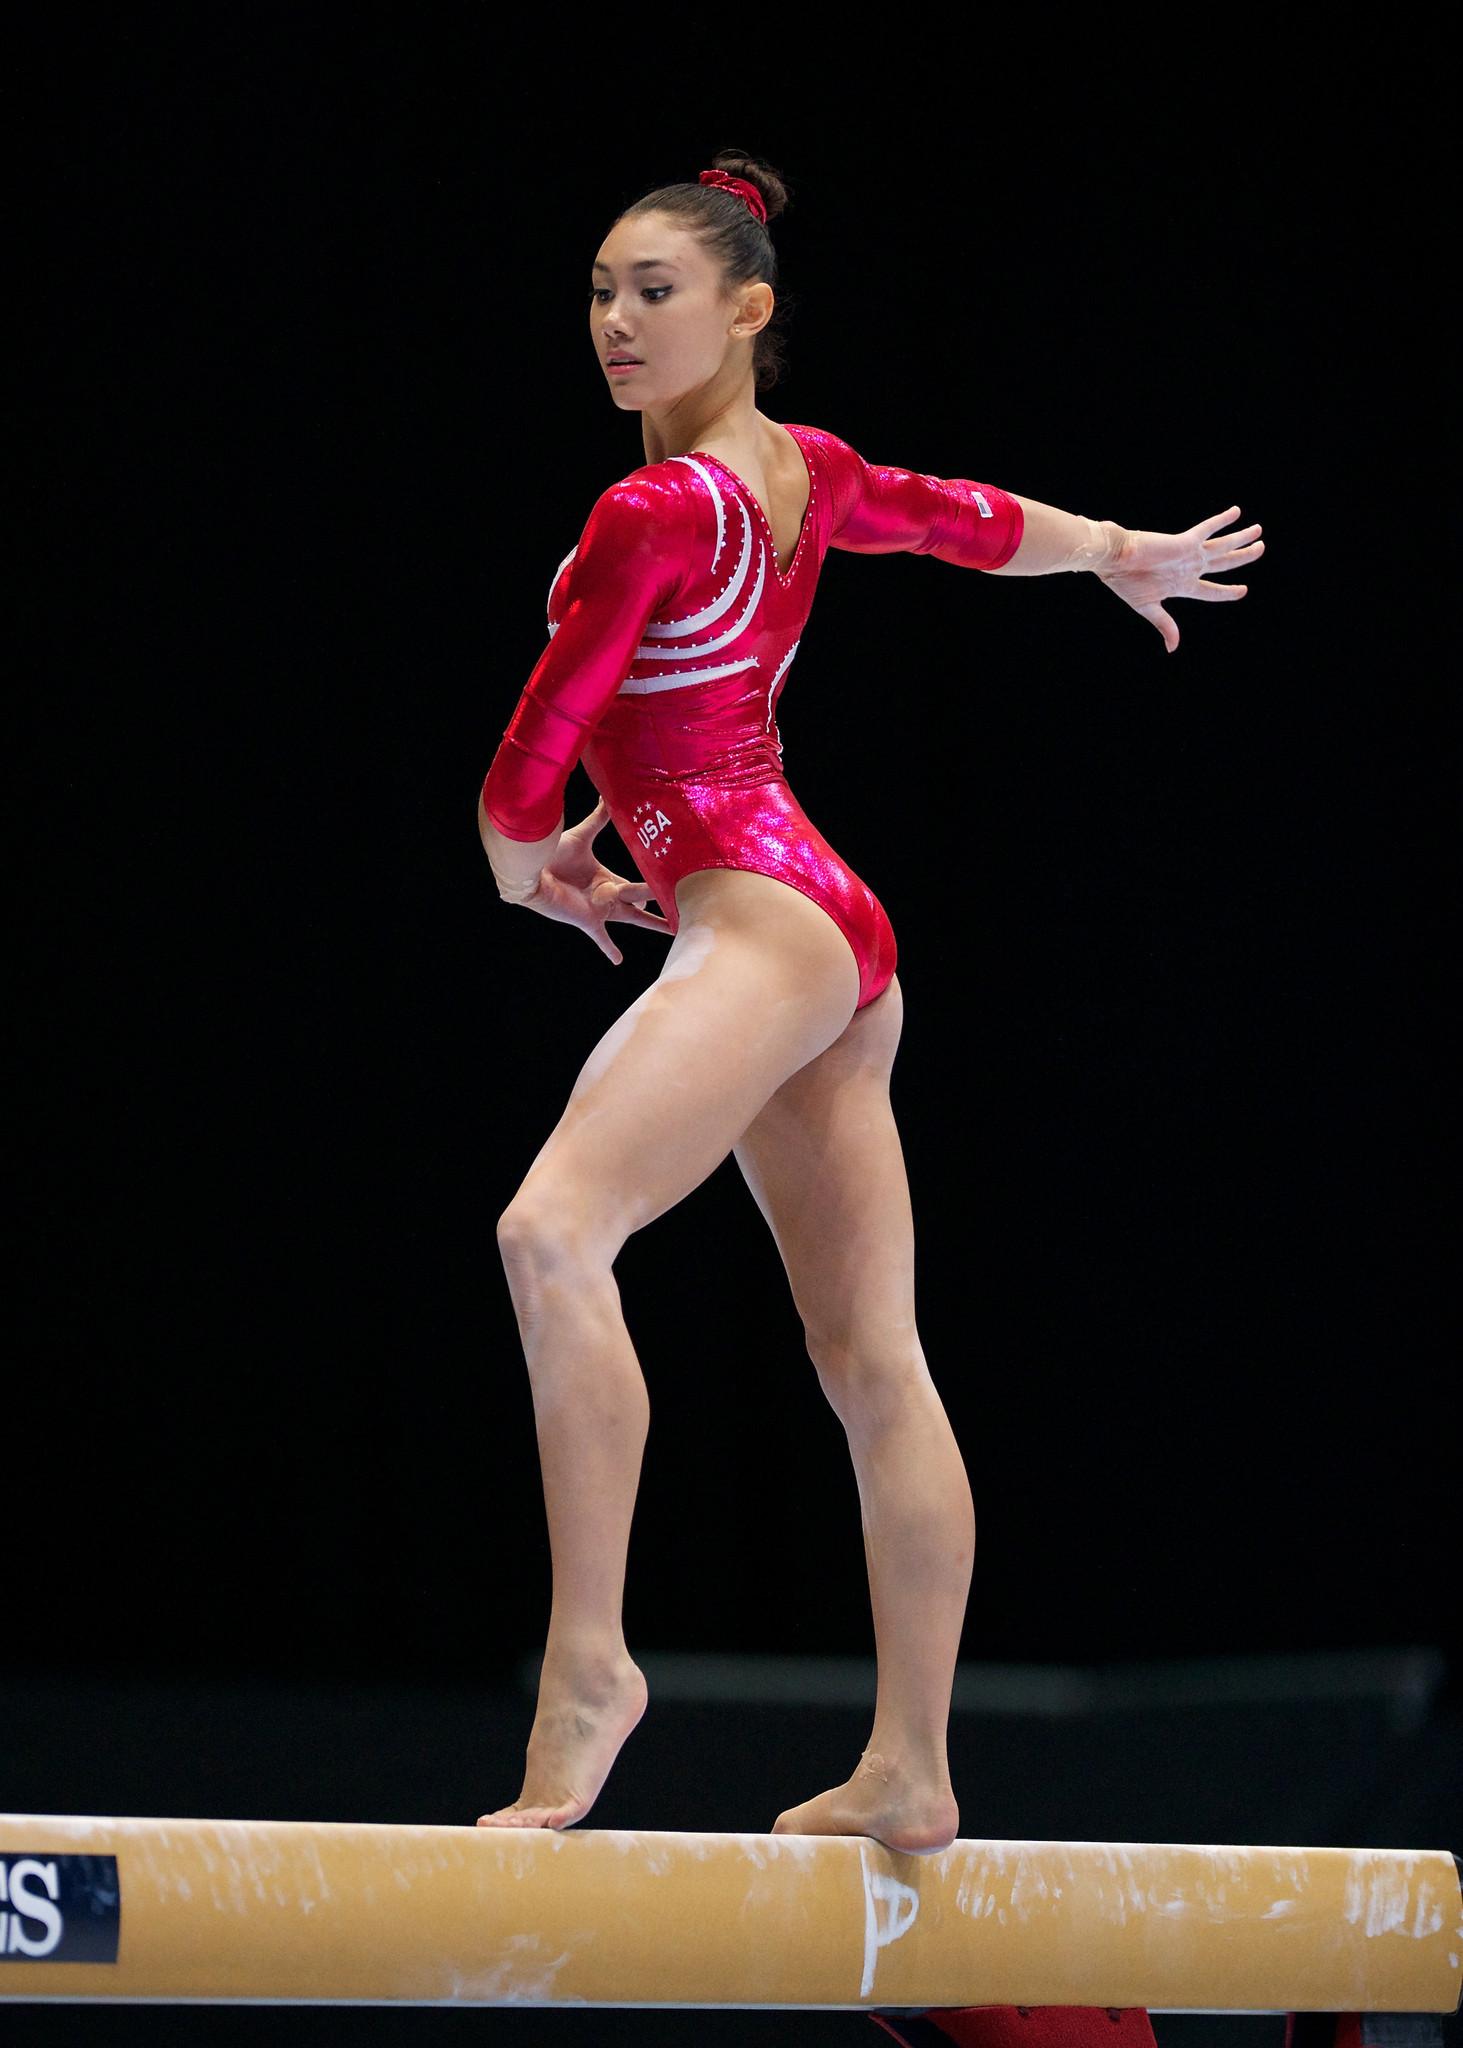 U.S. gymnast Kyla Ross keeps busy life in balance ...